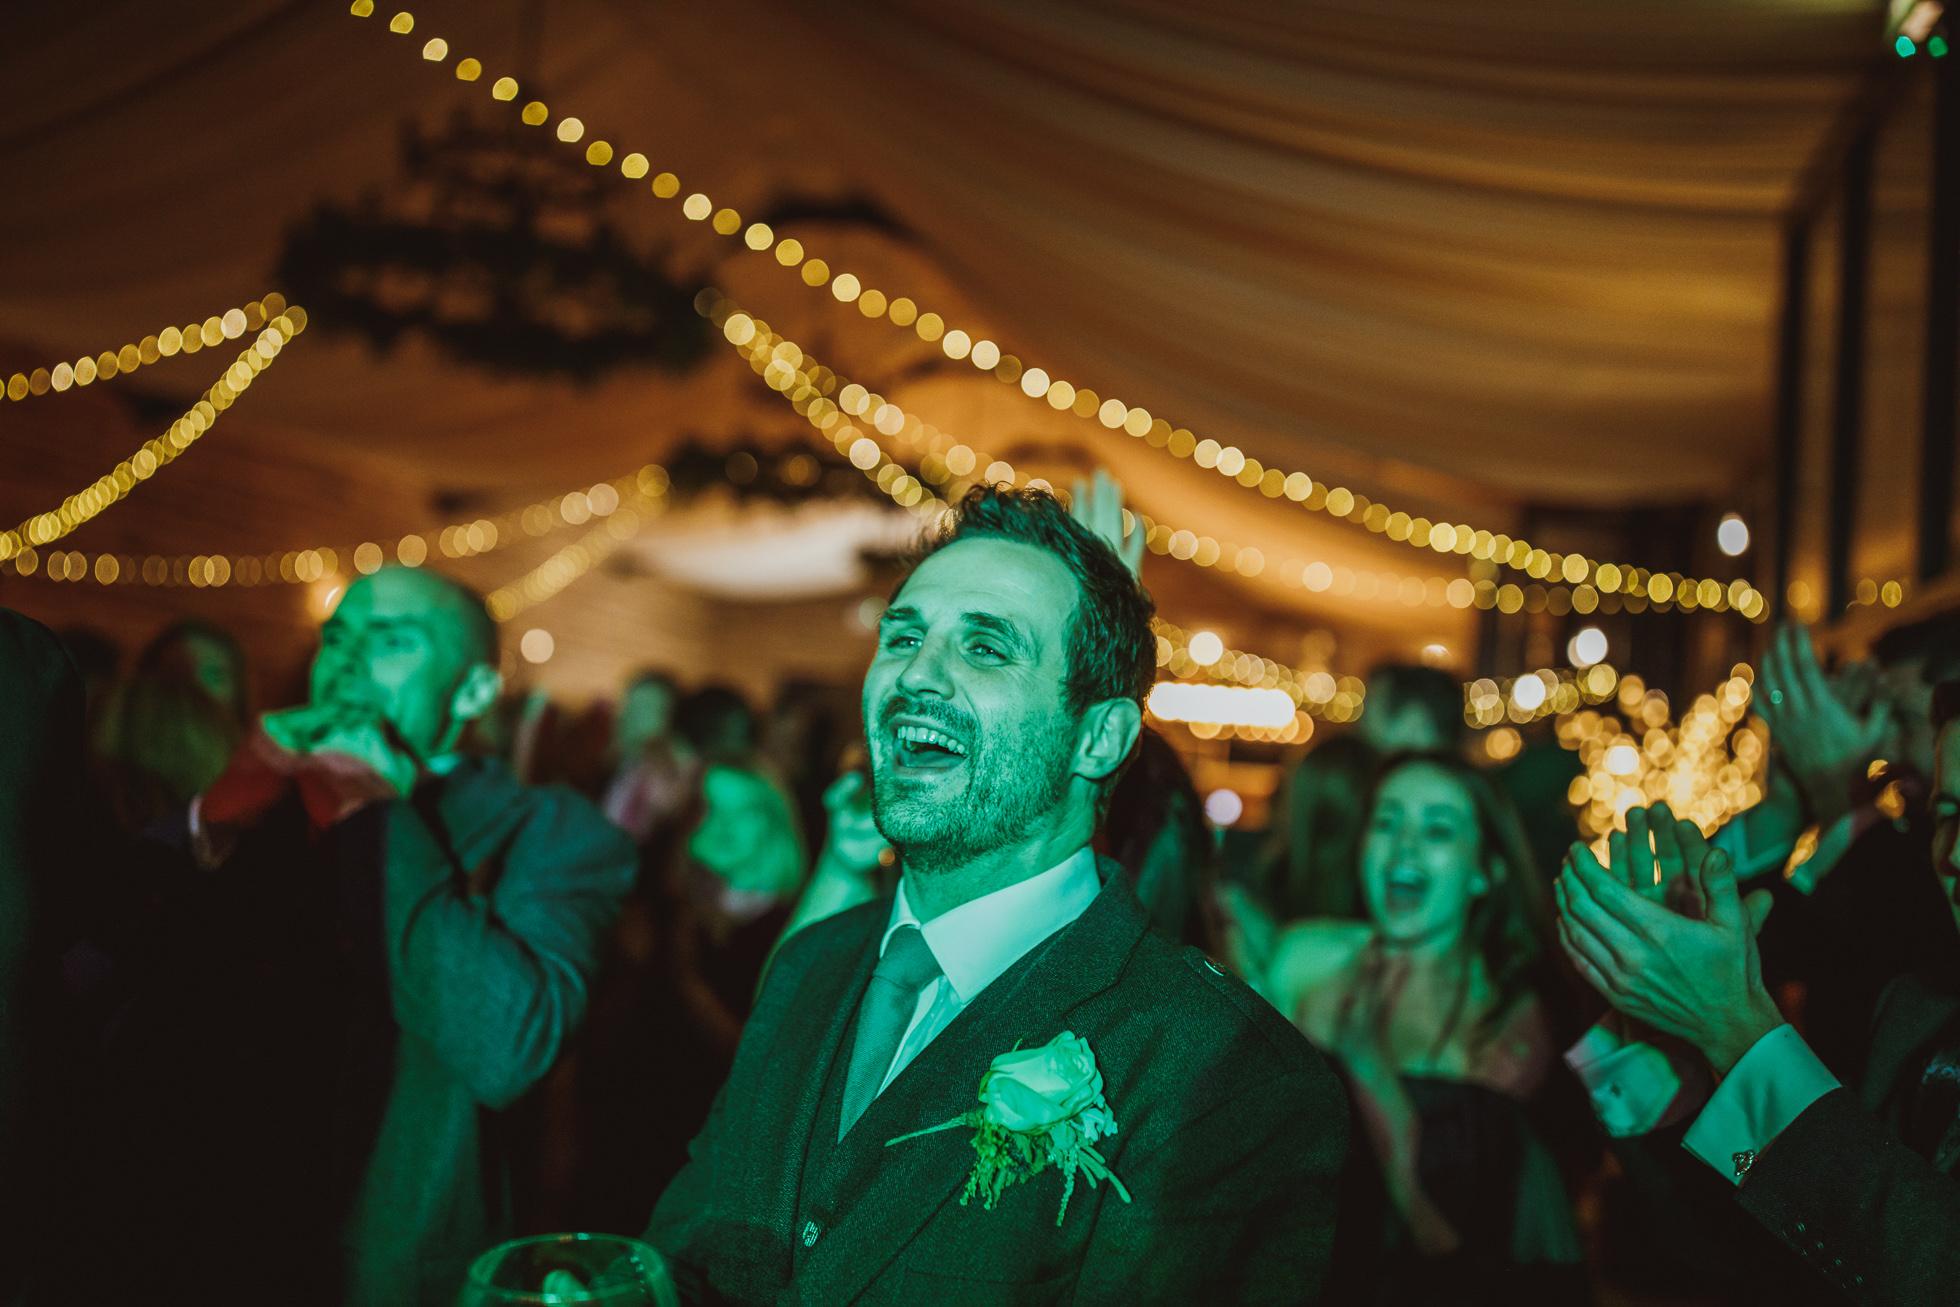 hornington_manor_wedding_photographer-125.jpg